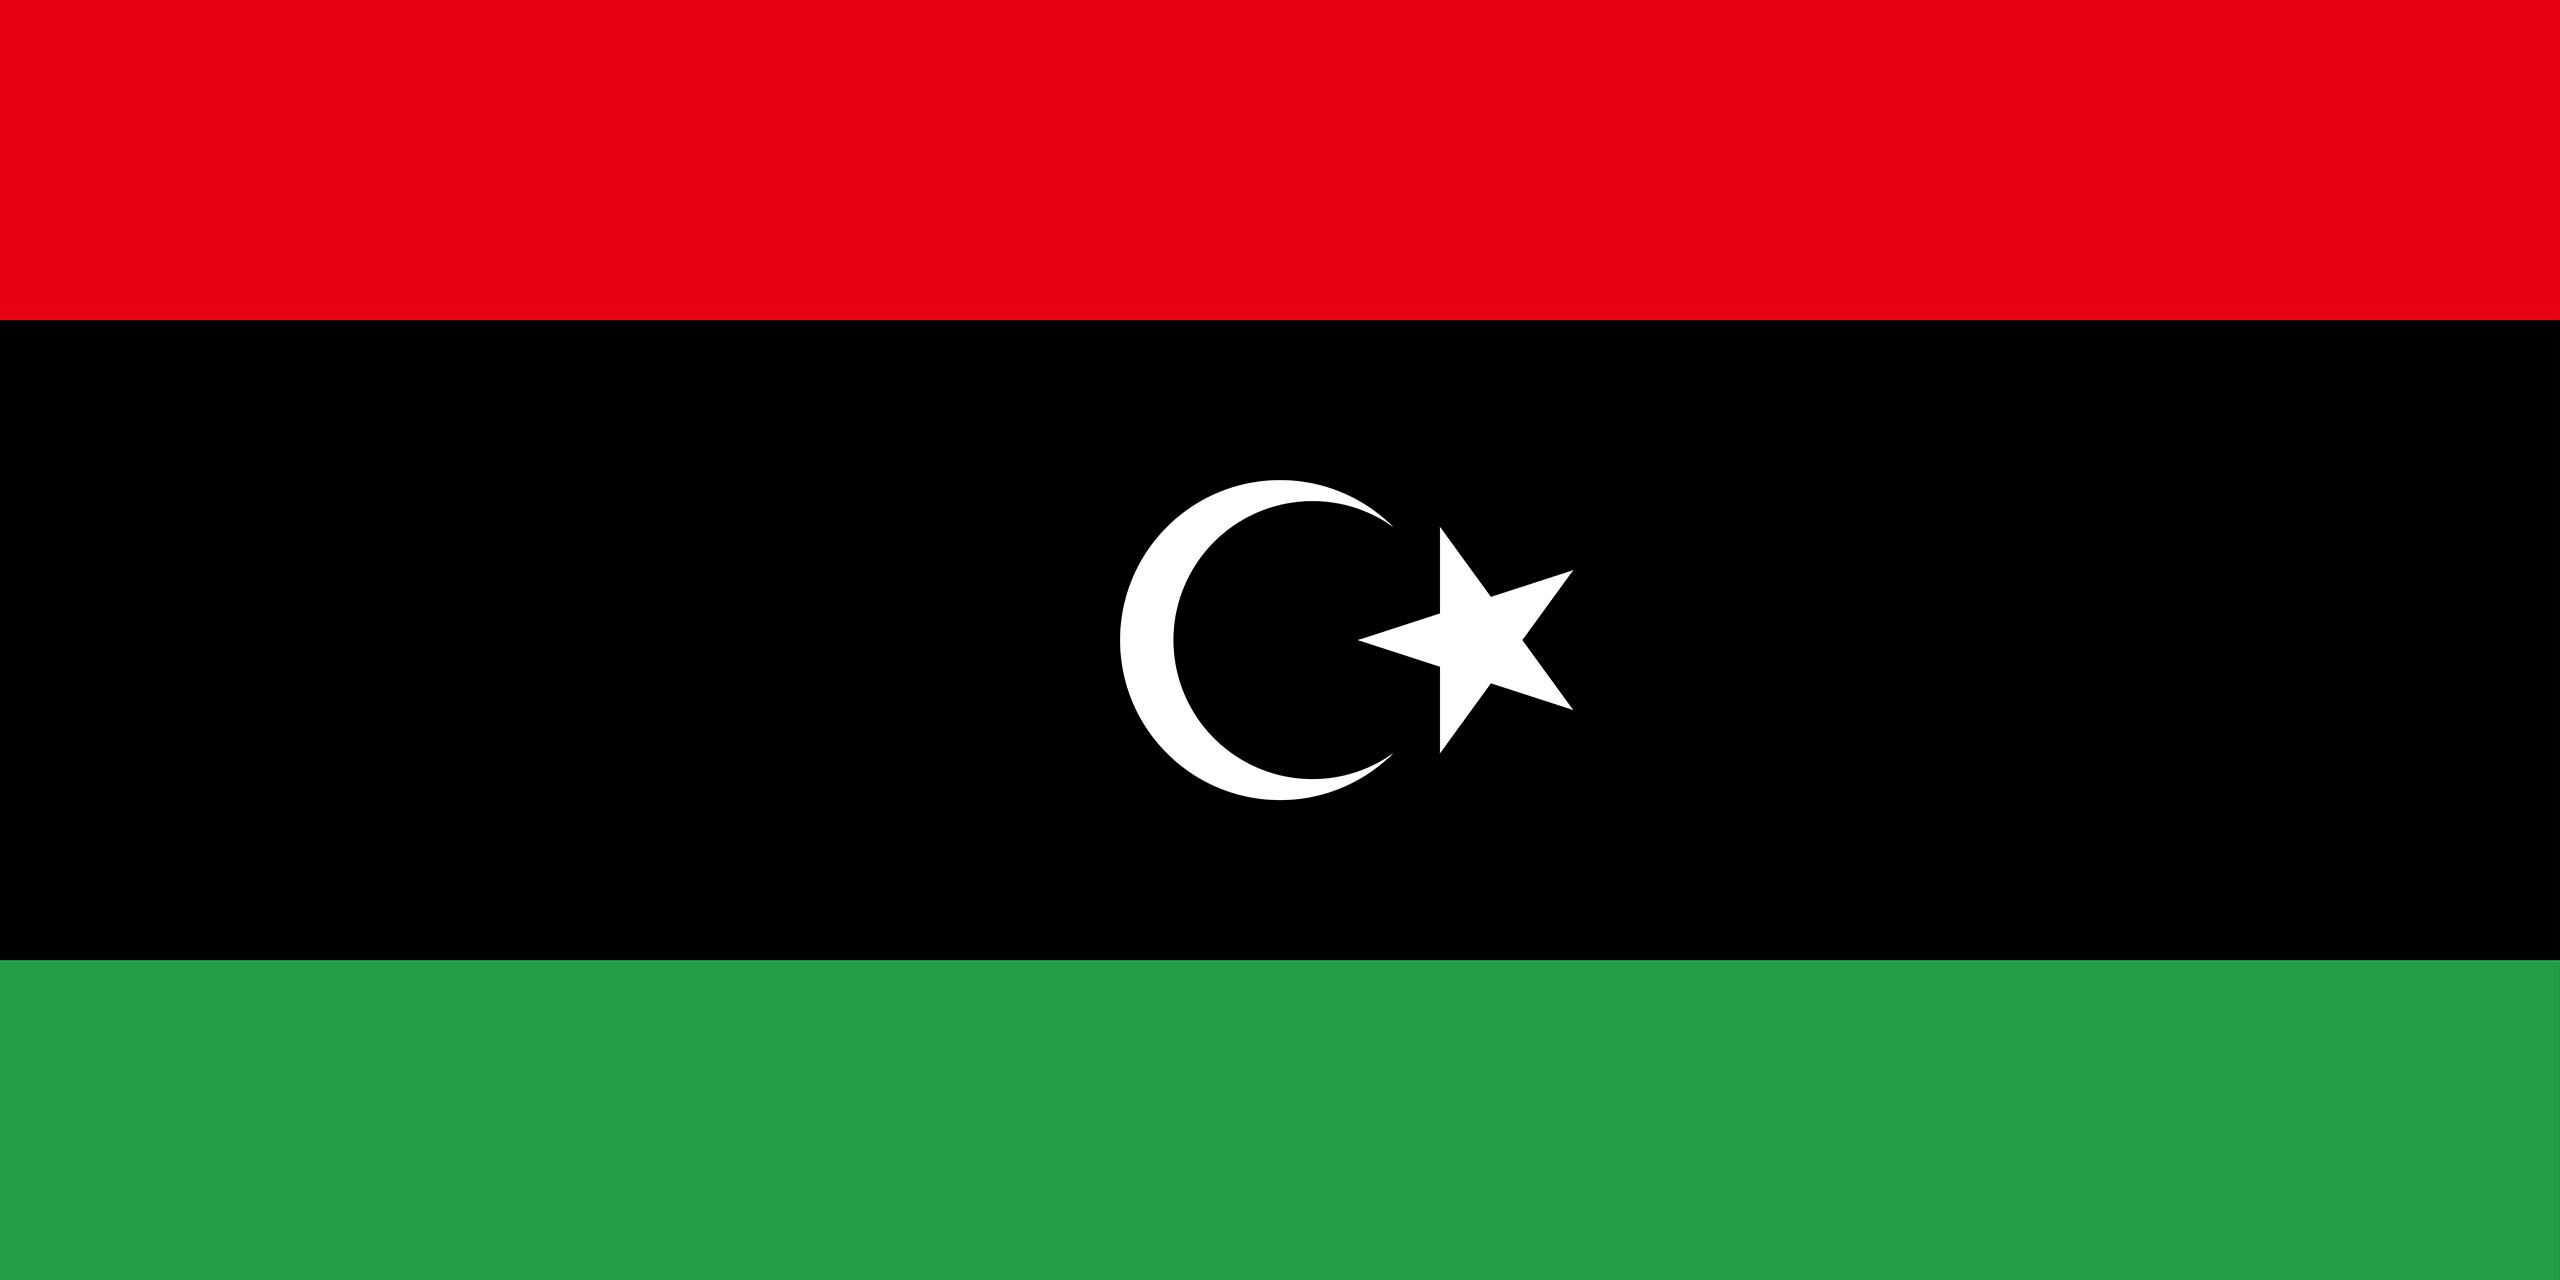 libia, देश, emblema, लोग�प्रतीकbolo - HD वॉलपेपर - प्रोफेसर-falken.com